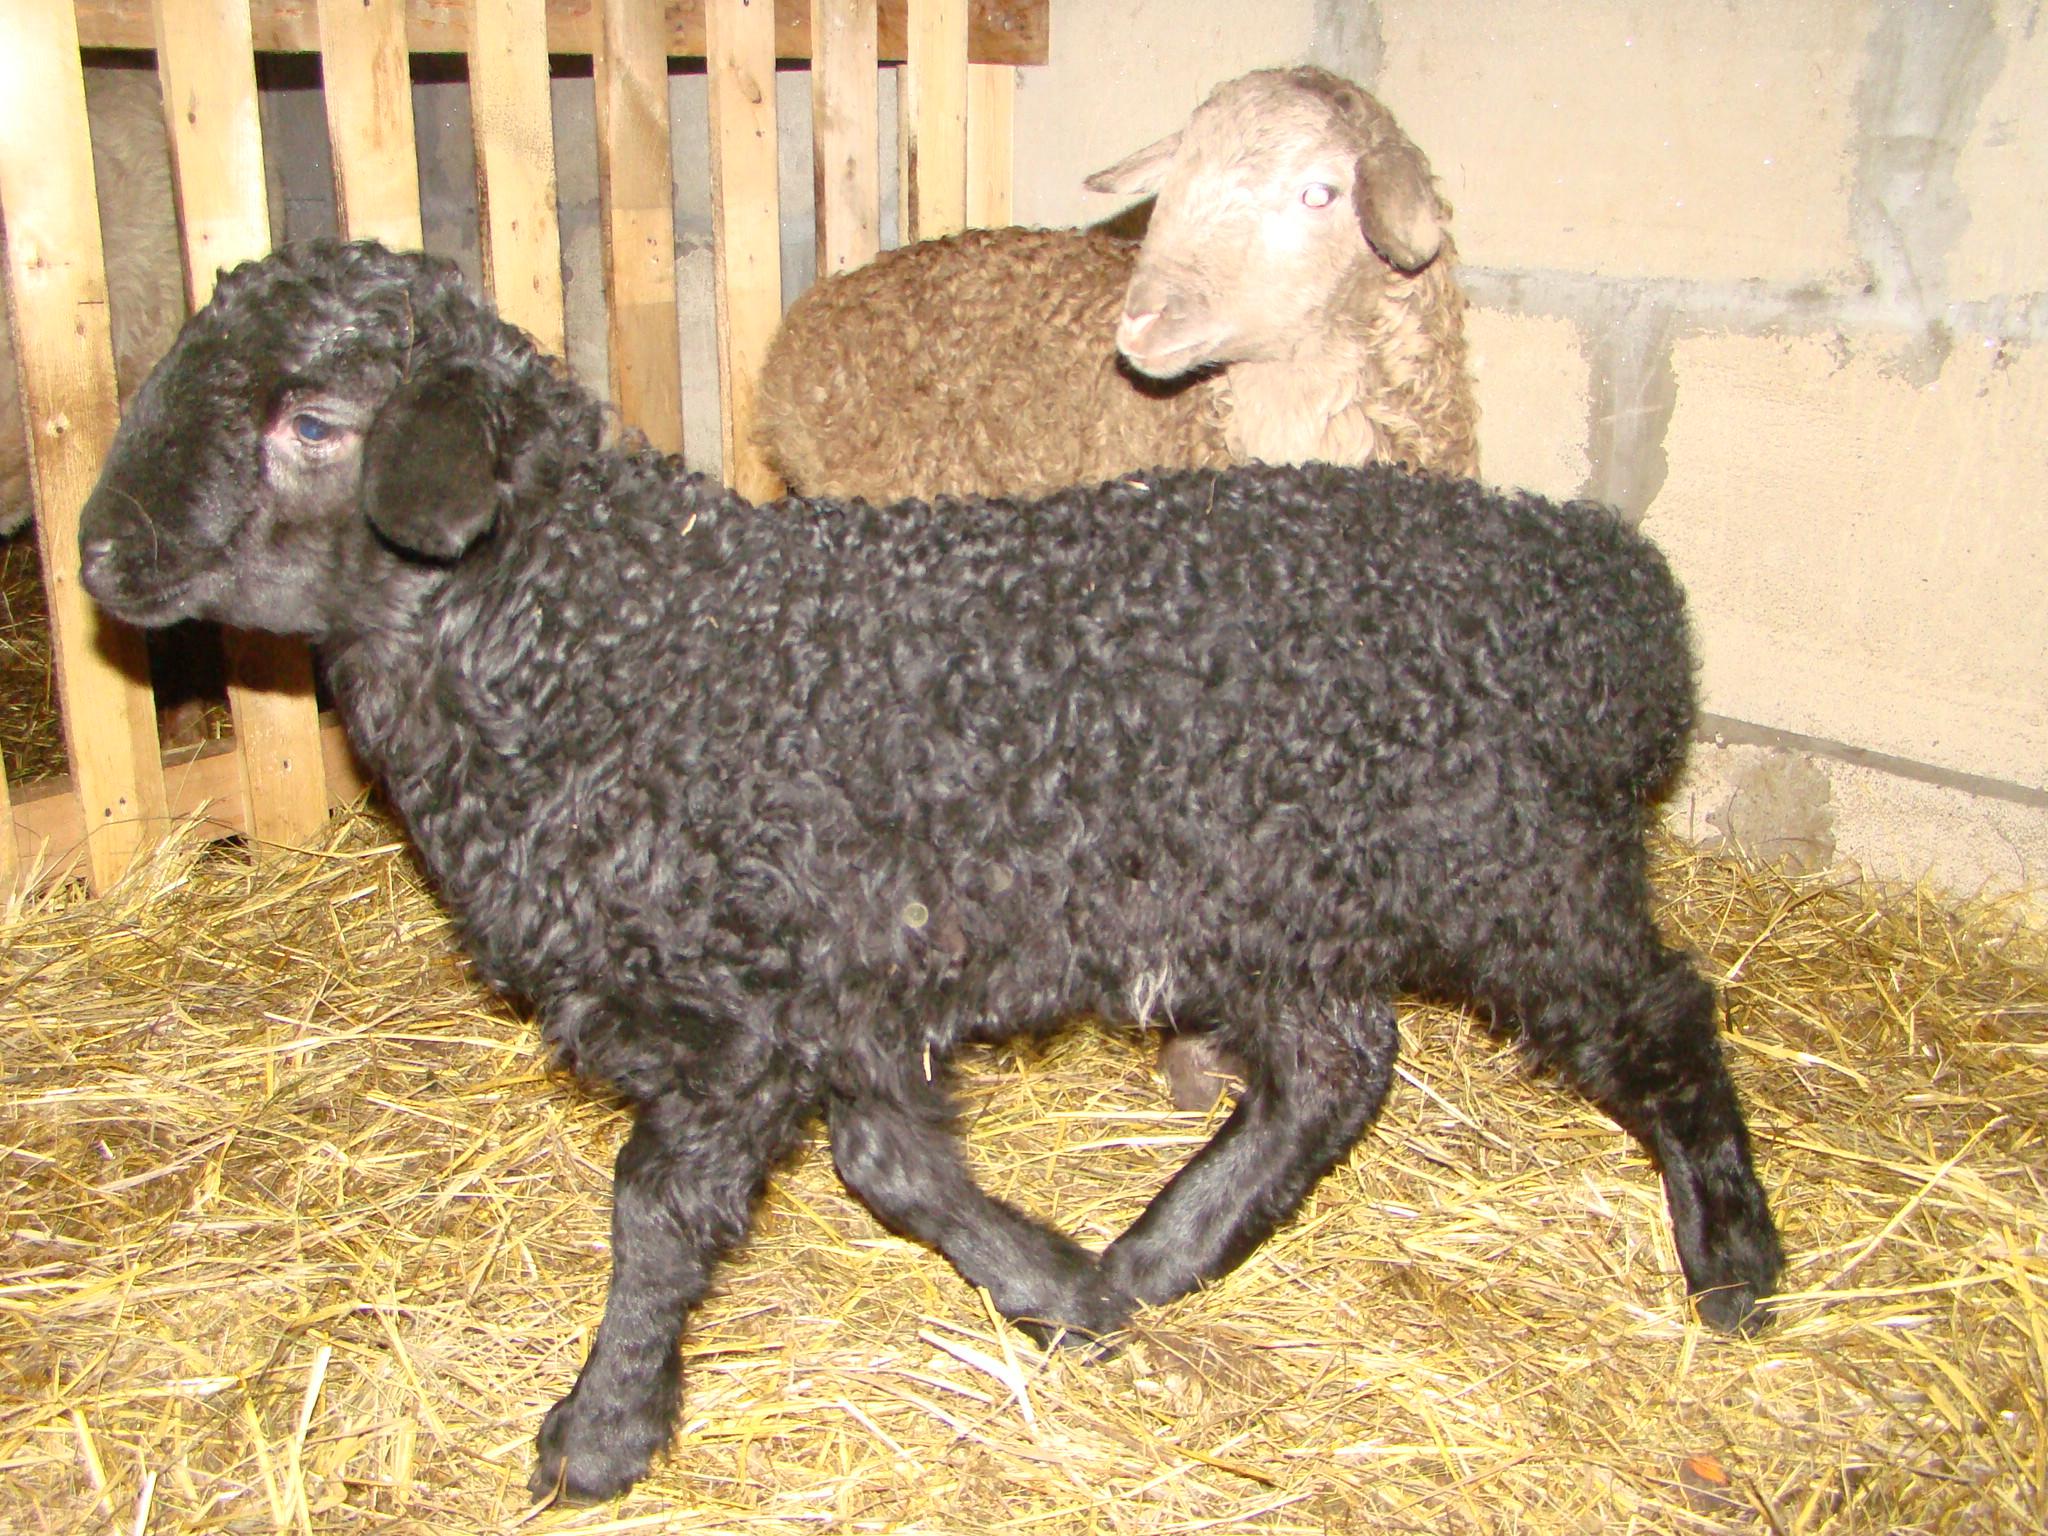 курдючные овцы фото готовьте аджапсандал